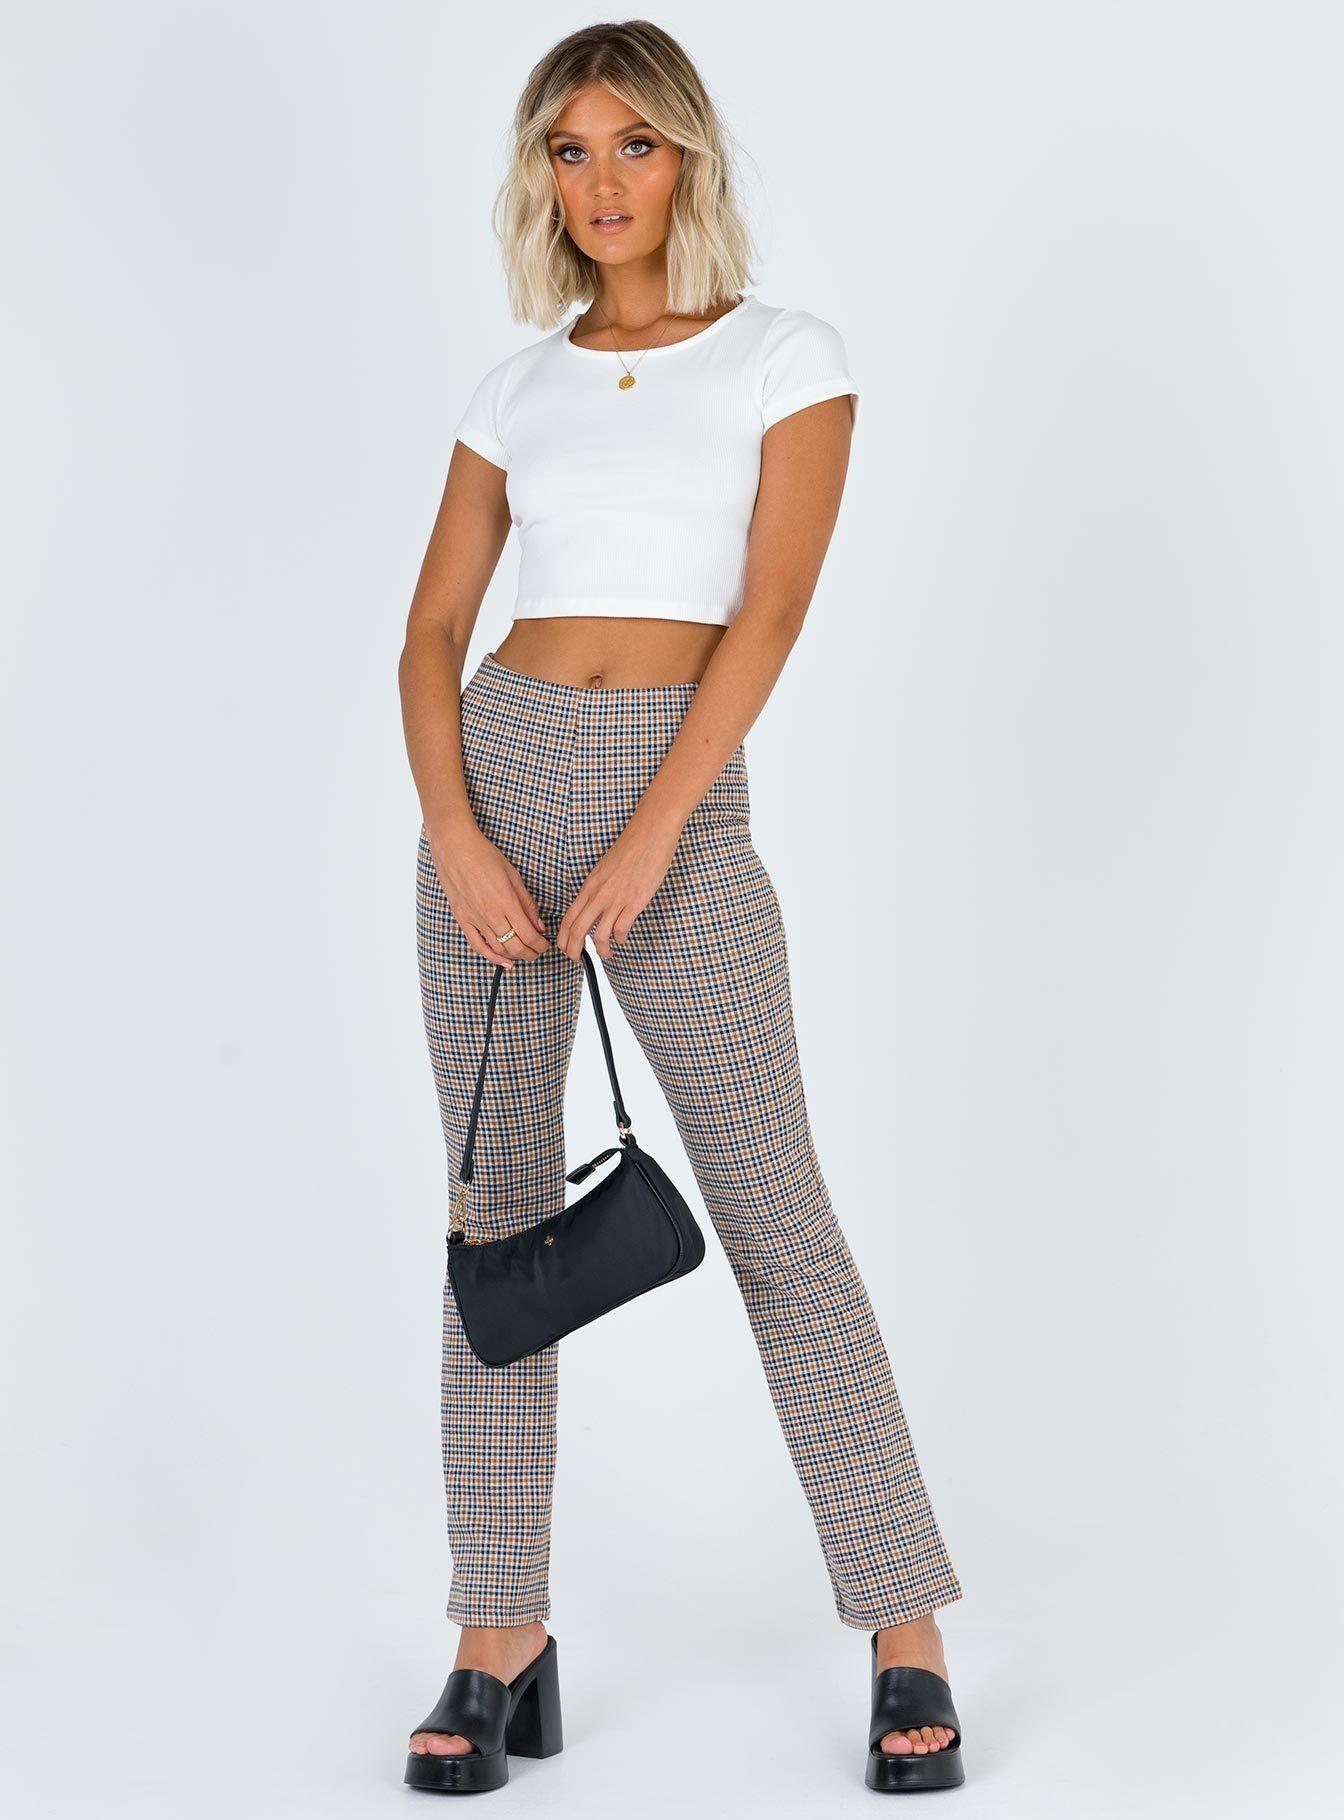 Franky Pant US 0 / Multi Pants, High waisted pants